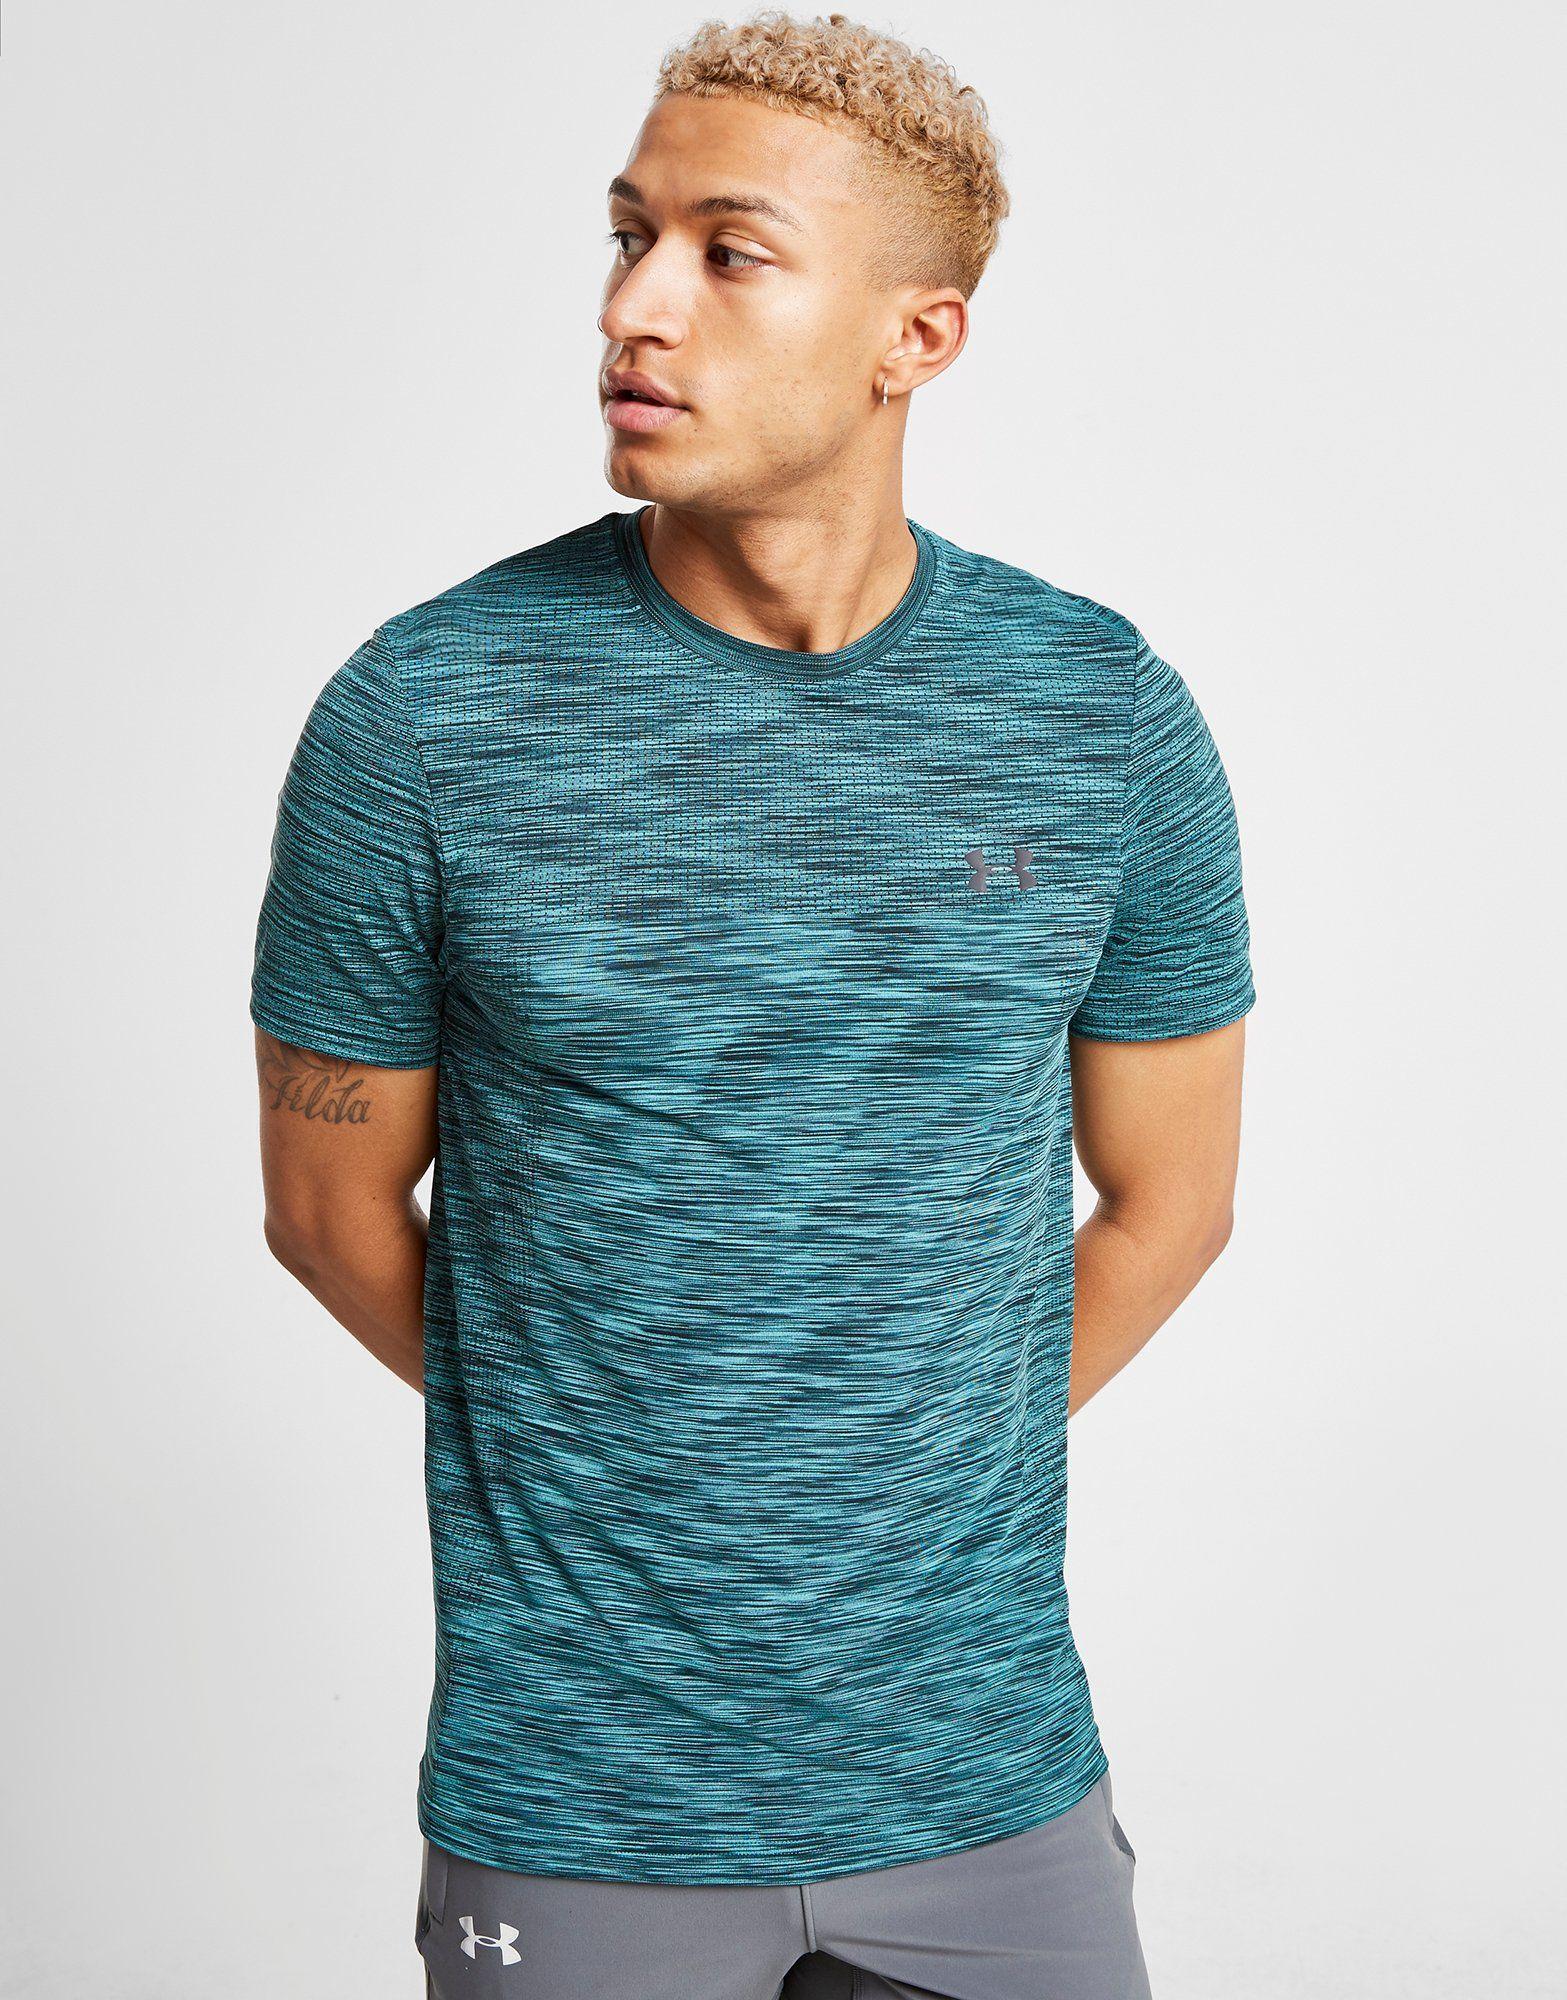 572f2153ce Under Armour Vanish Seamless Short Sleeve T-Shirt | JD Sports